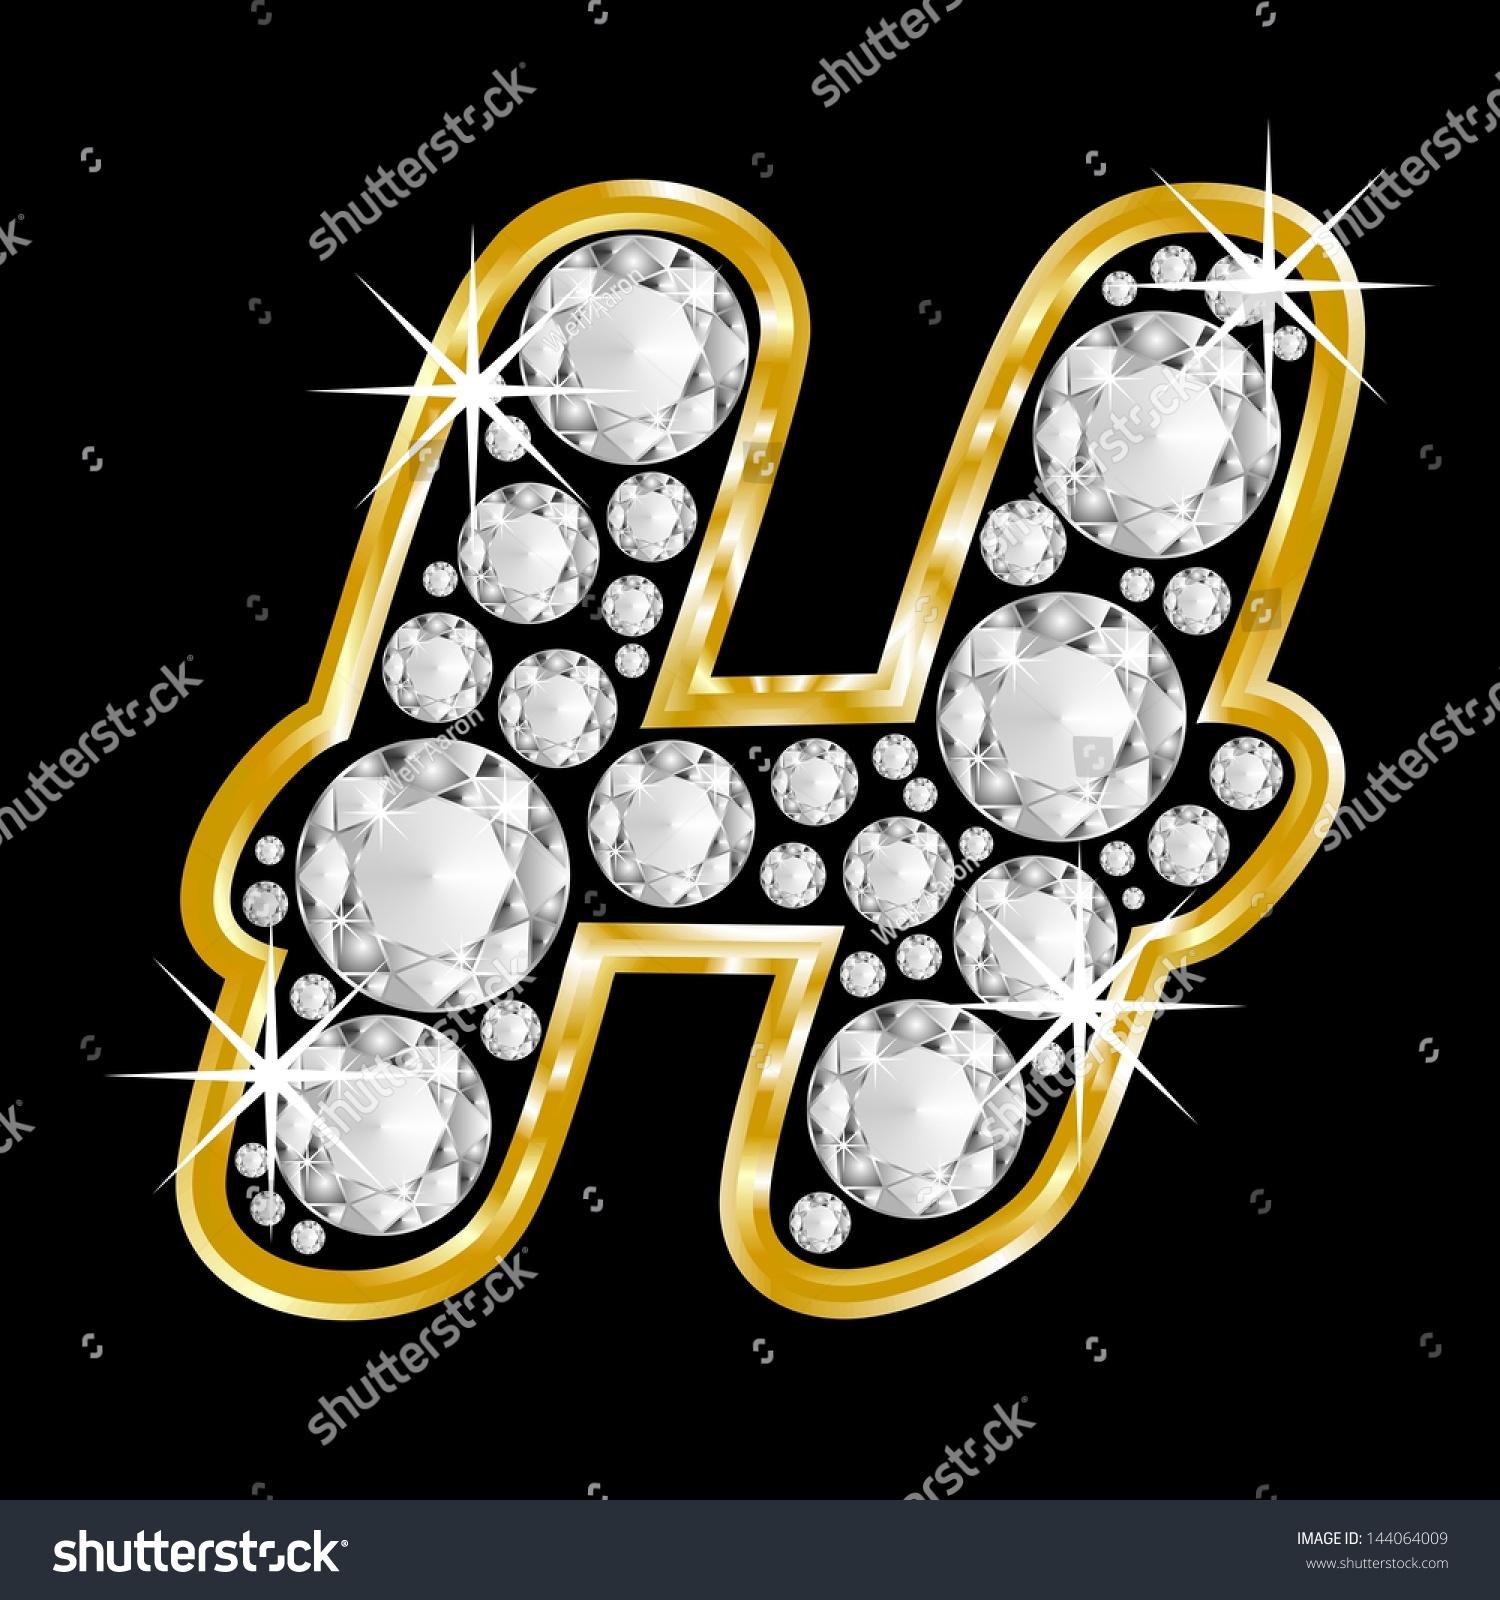 H Letter In Diamond The Letter H In Diamon...